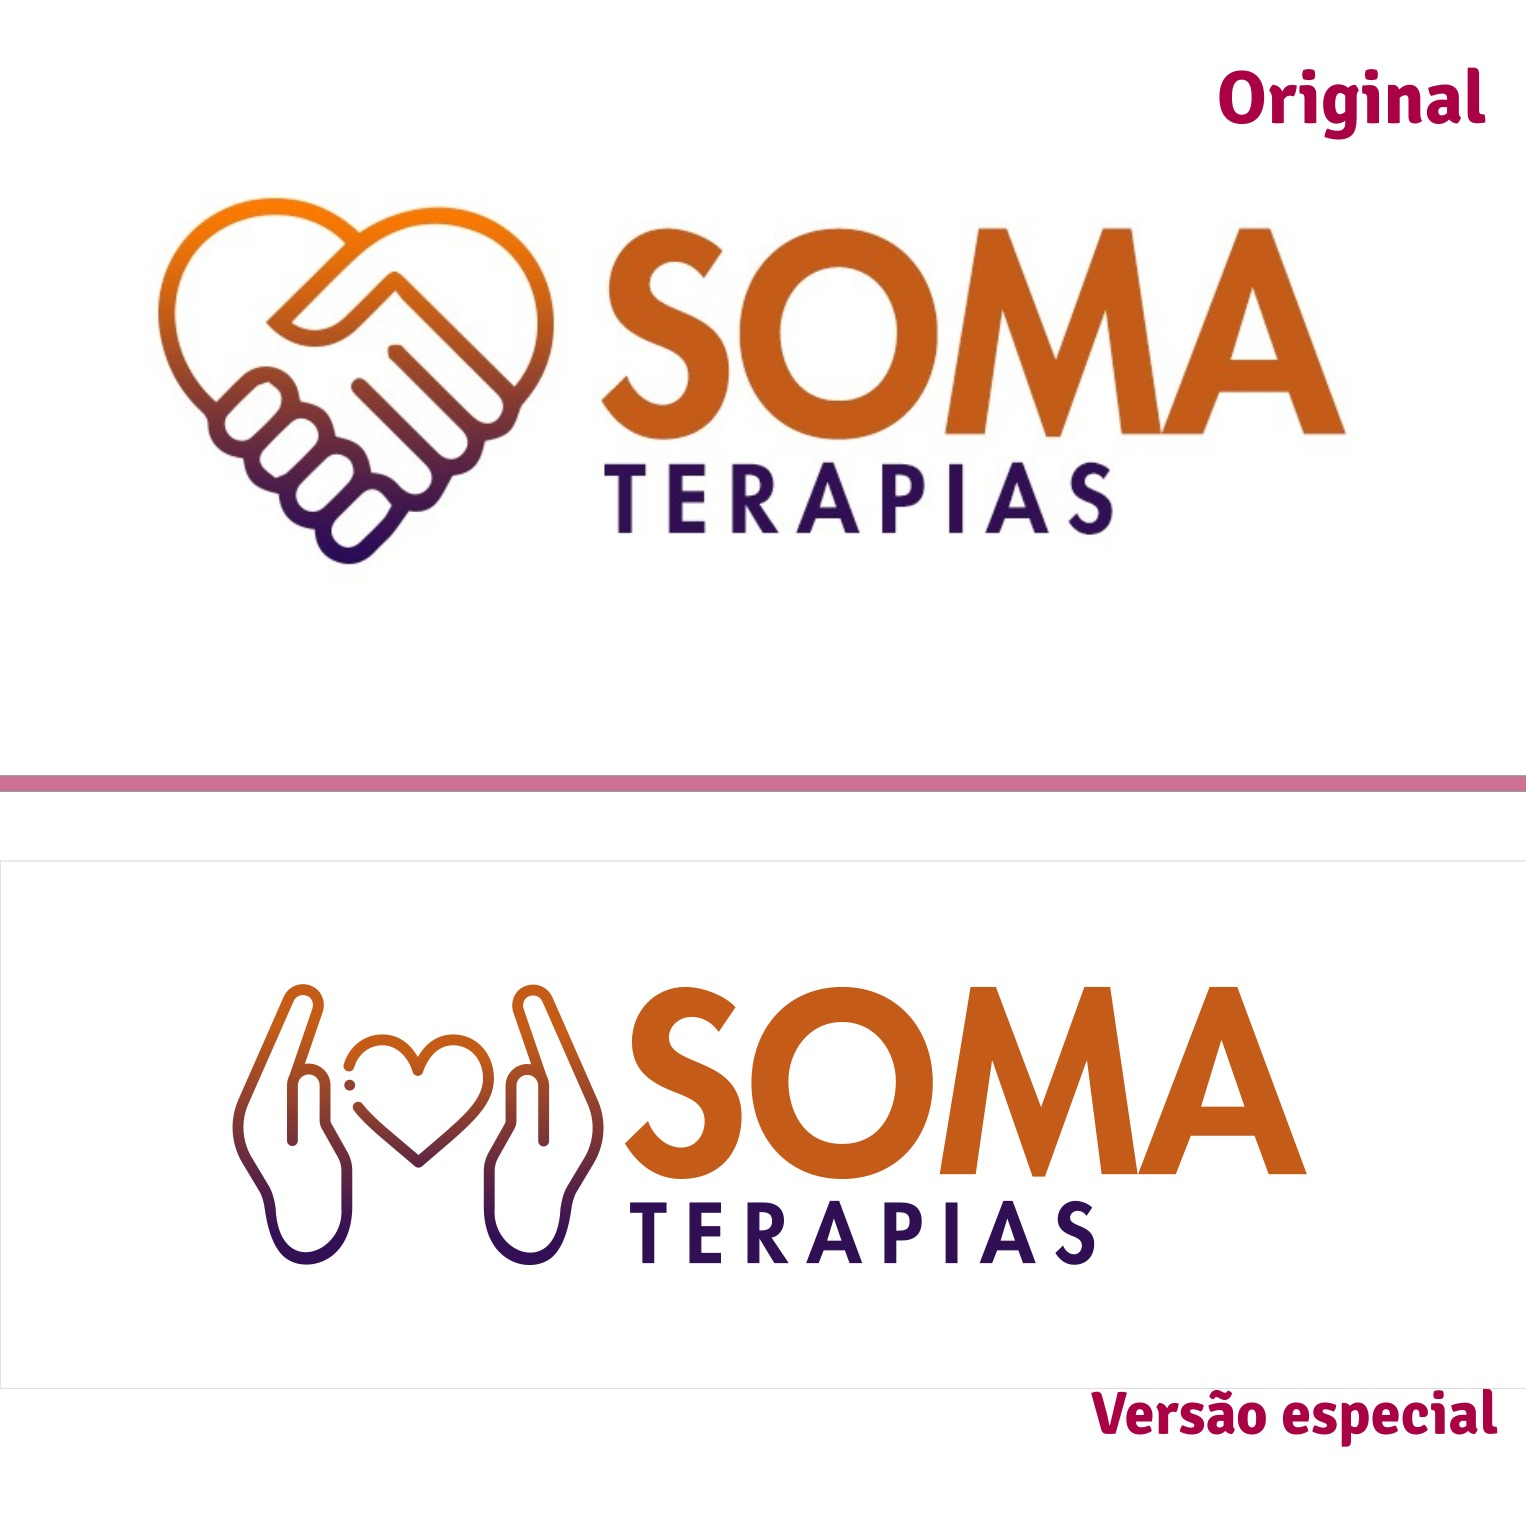 redesenho_logo_soma_terapias_edited